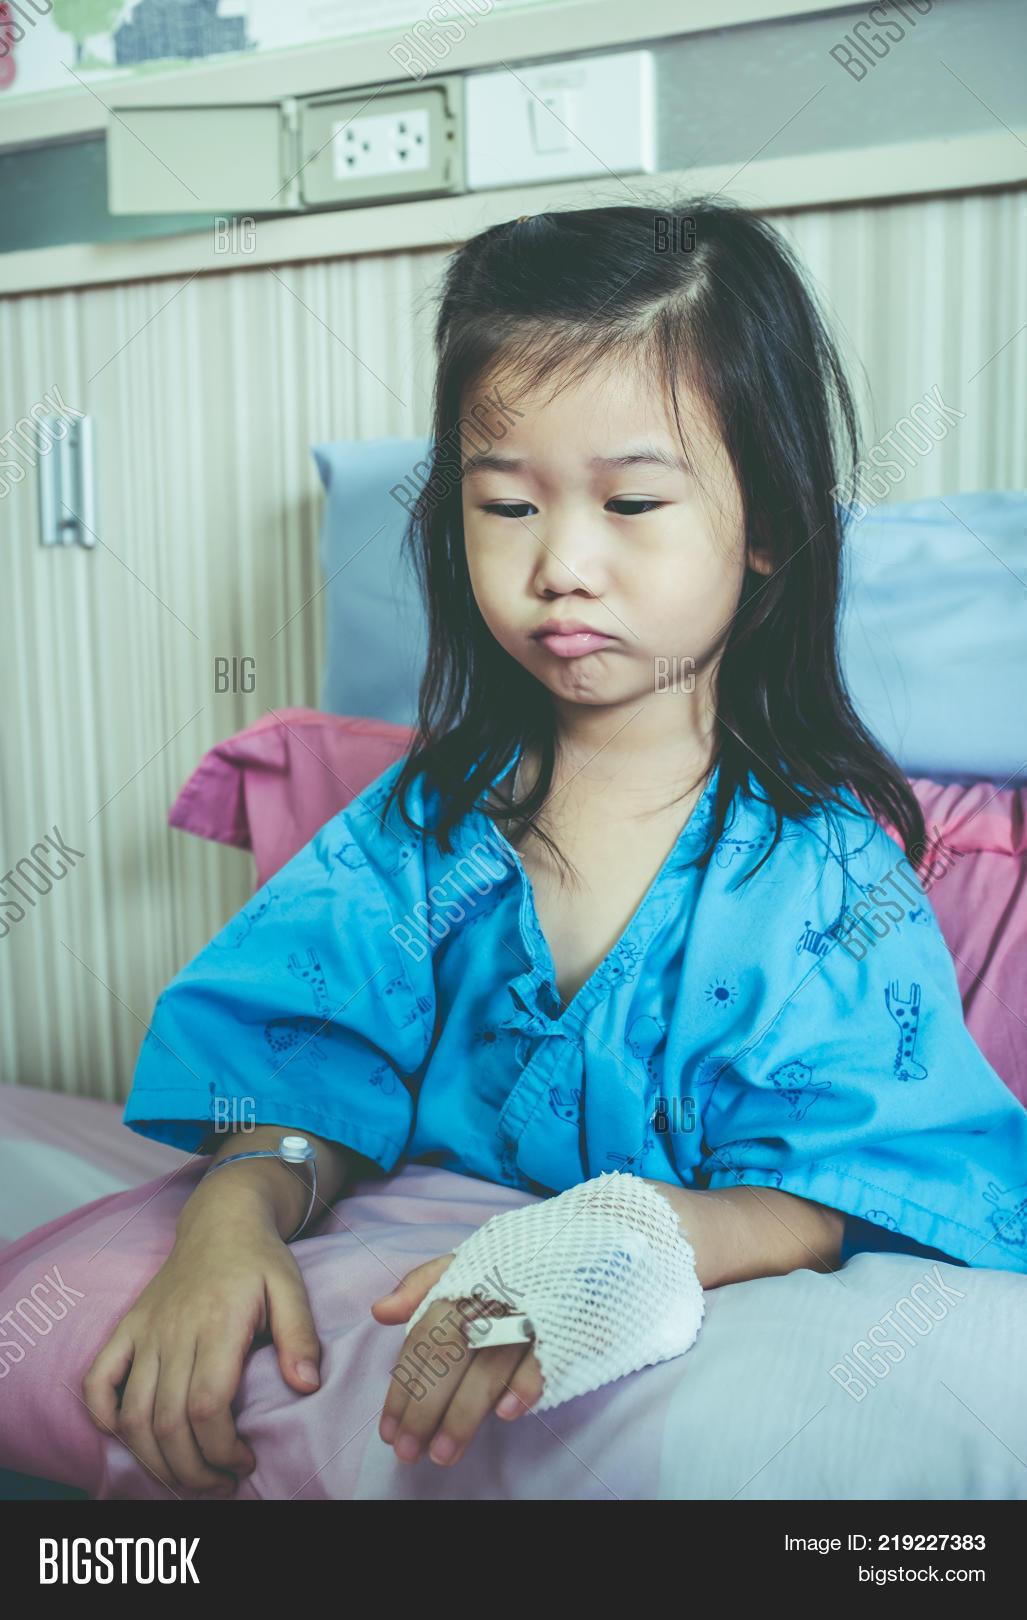 Illness Asian Child Image & Photo (Free Trial) | Bigstock